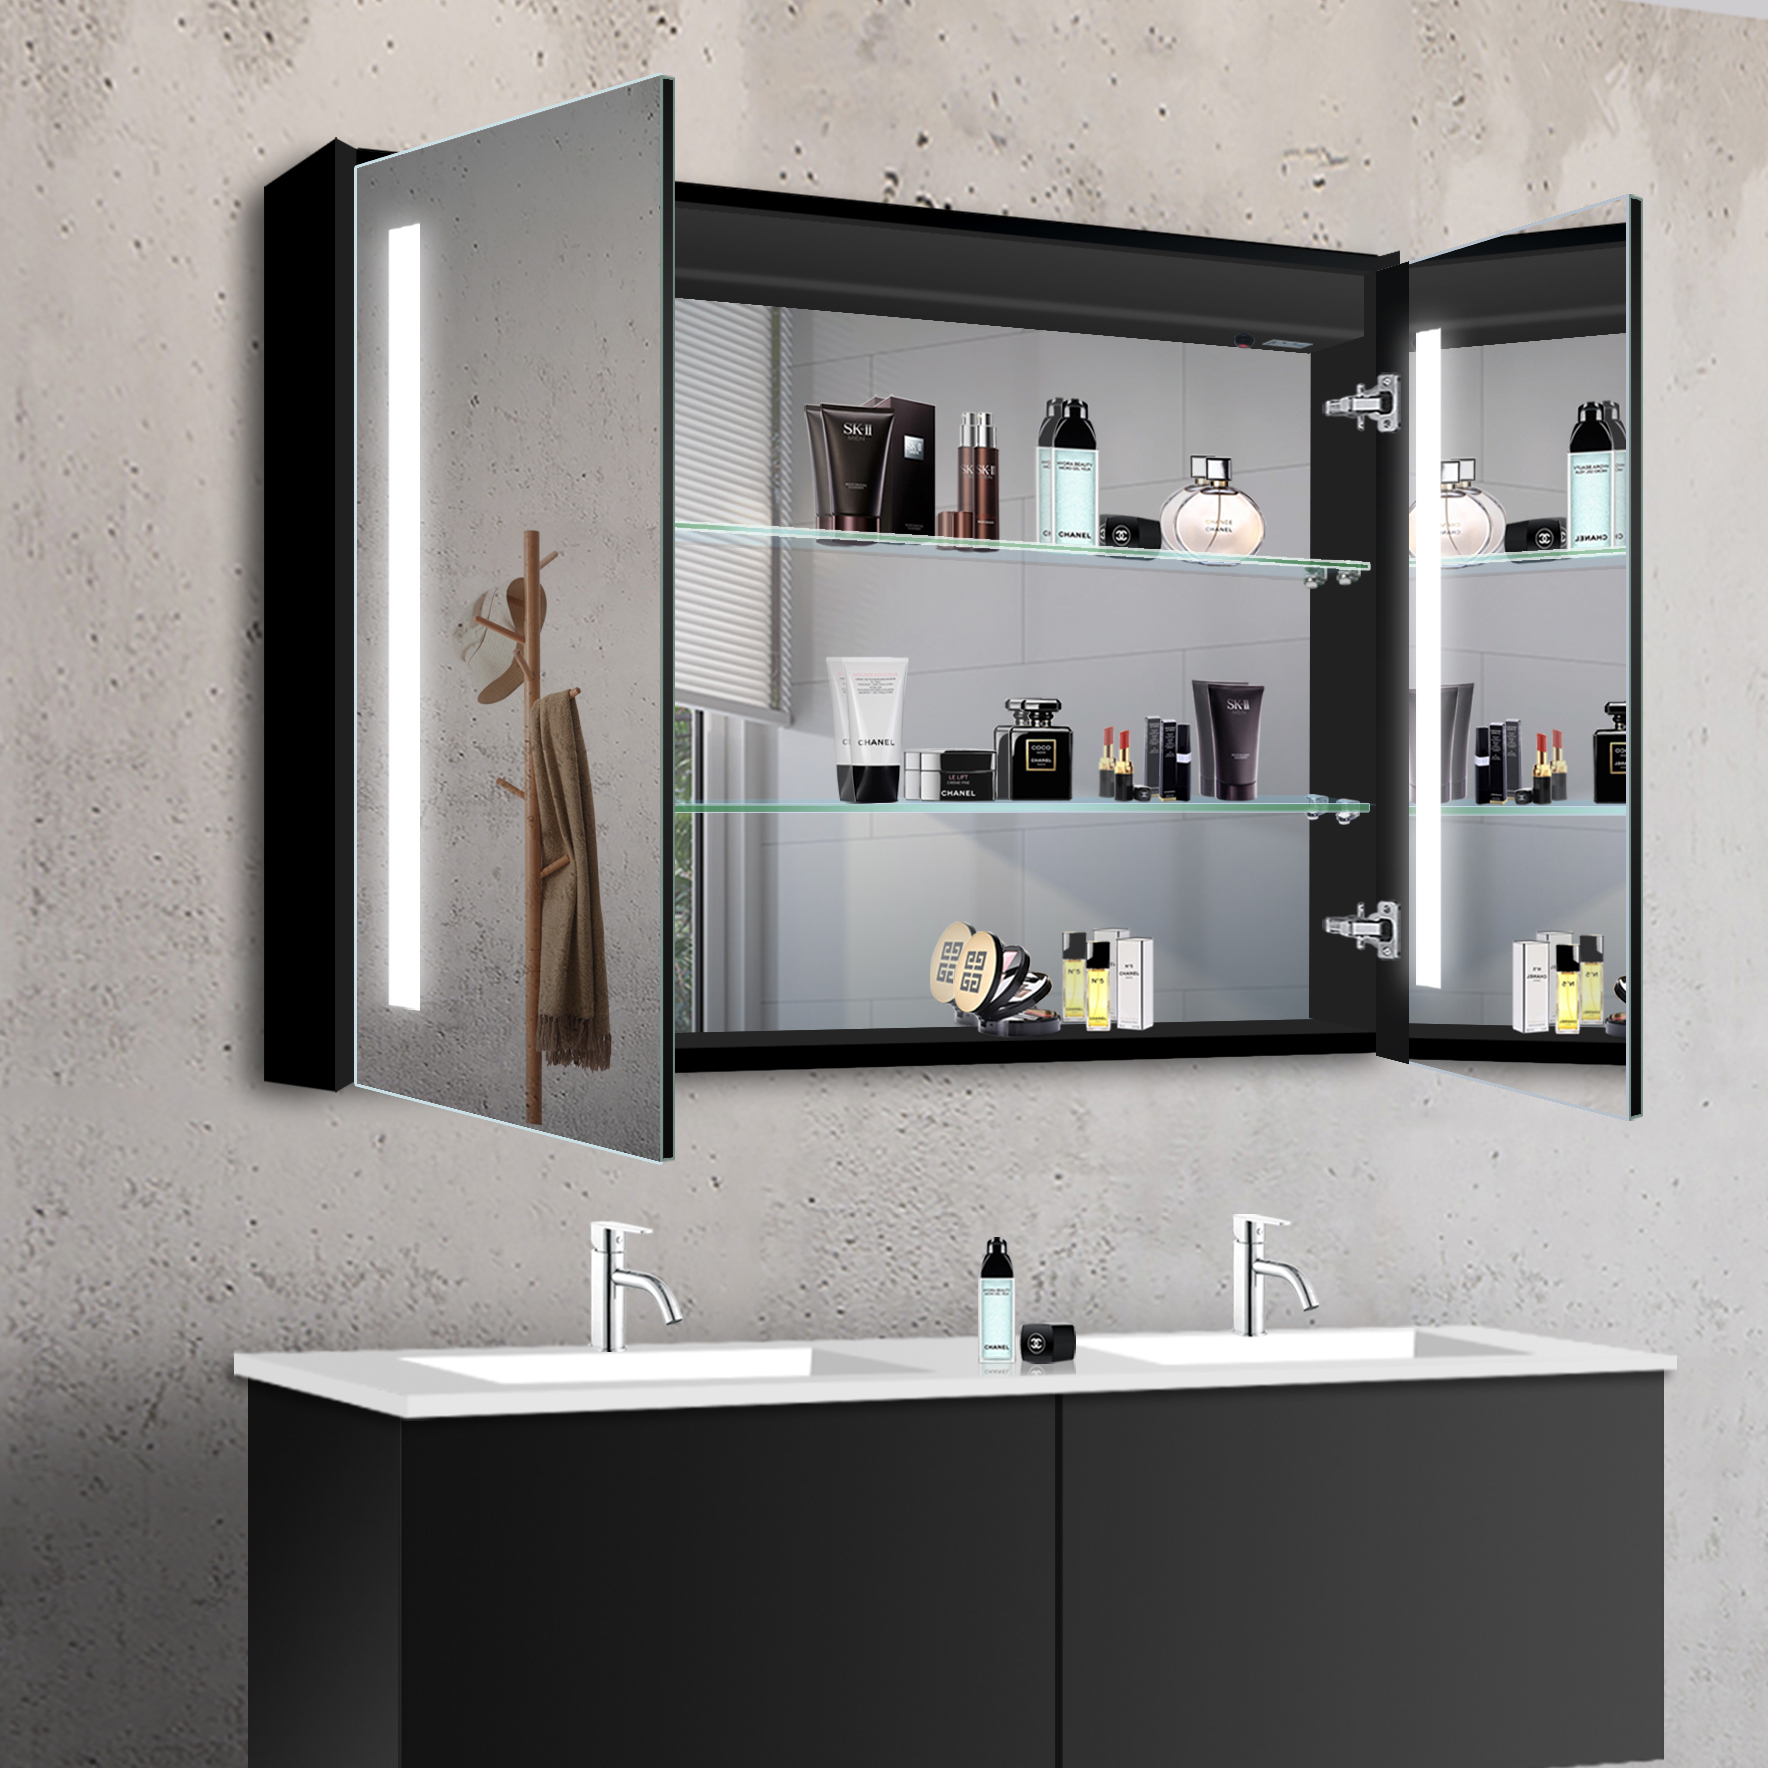 www.lux aqua.de   lux aqua Design Schwarz Aluminium LED Kalt ...